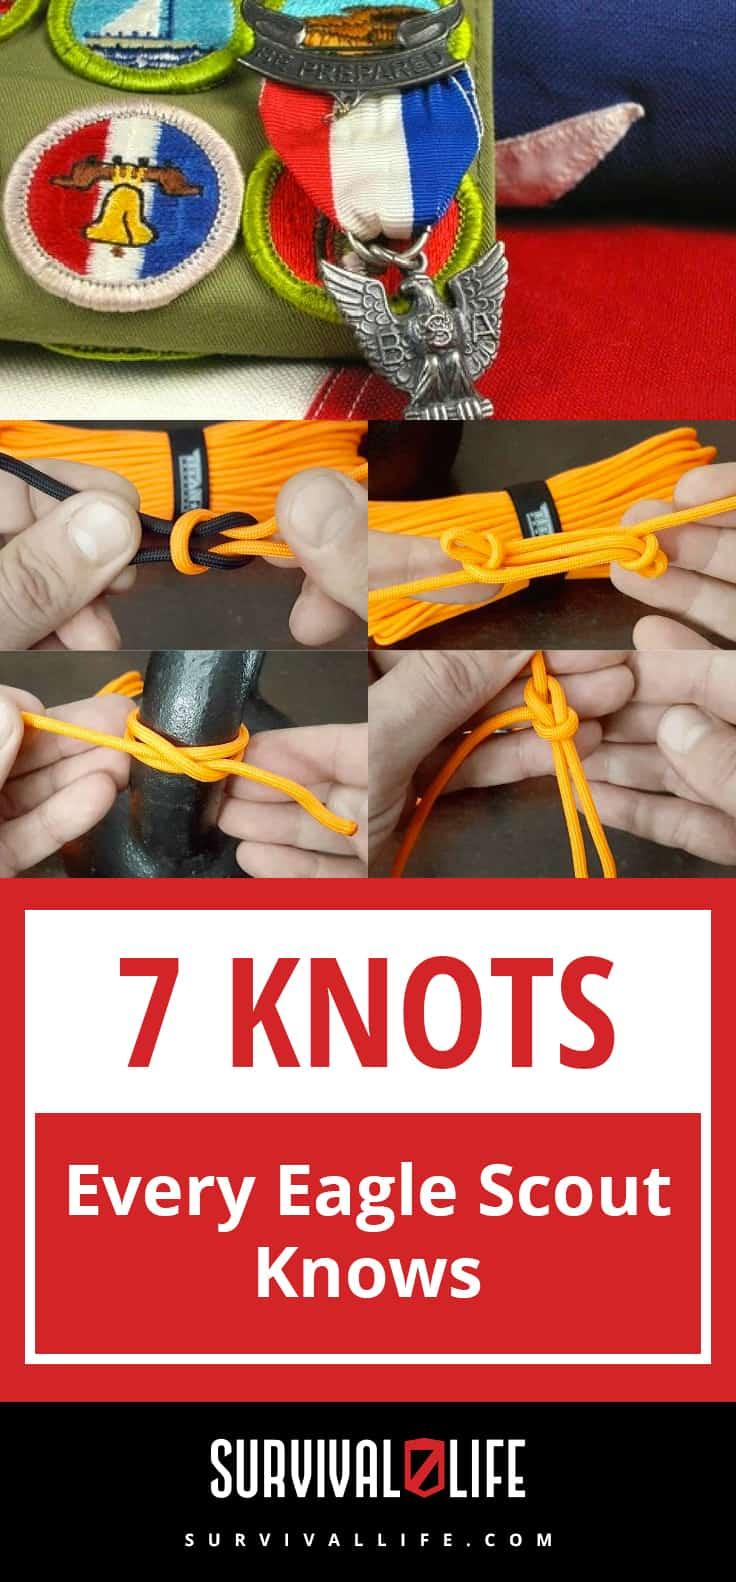 Knots Every Eagle Scout Knows   https://survivallife.com/knots-you-should-know/